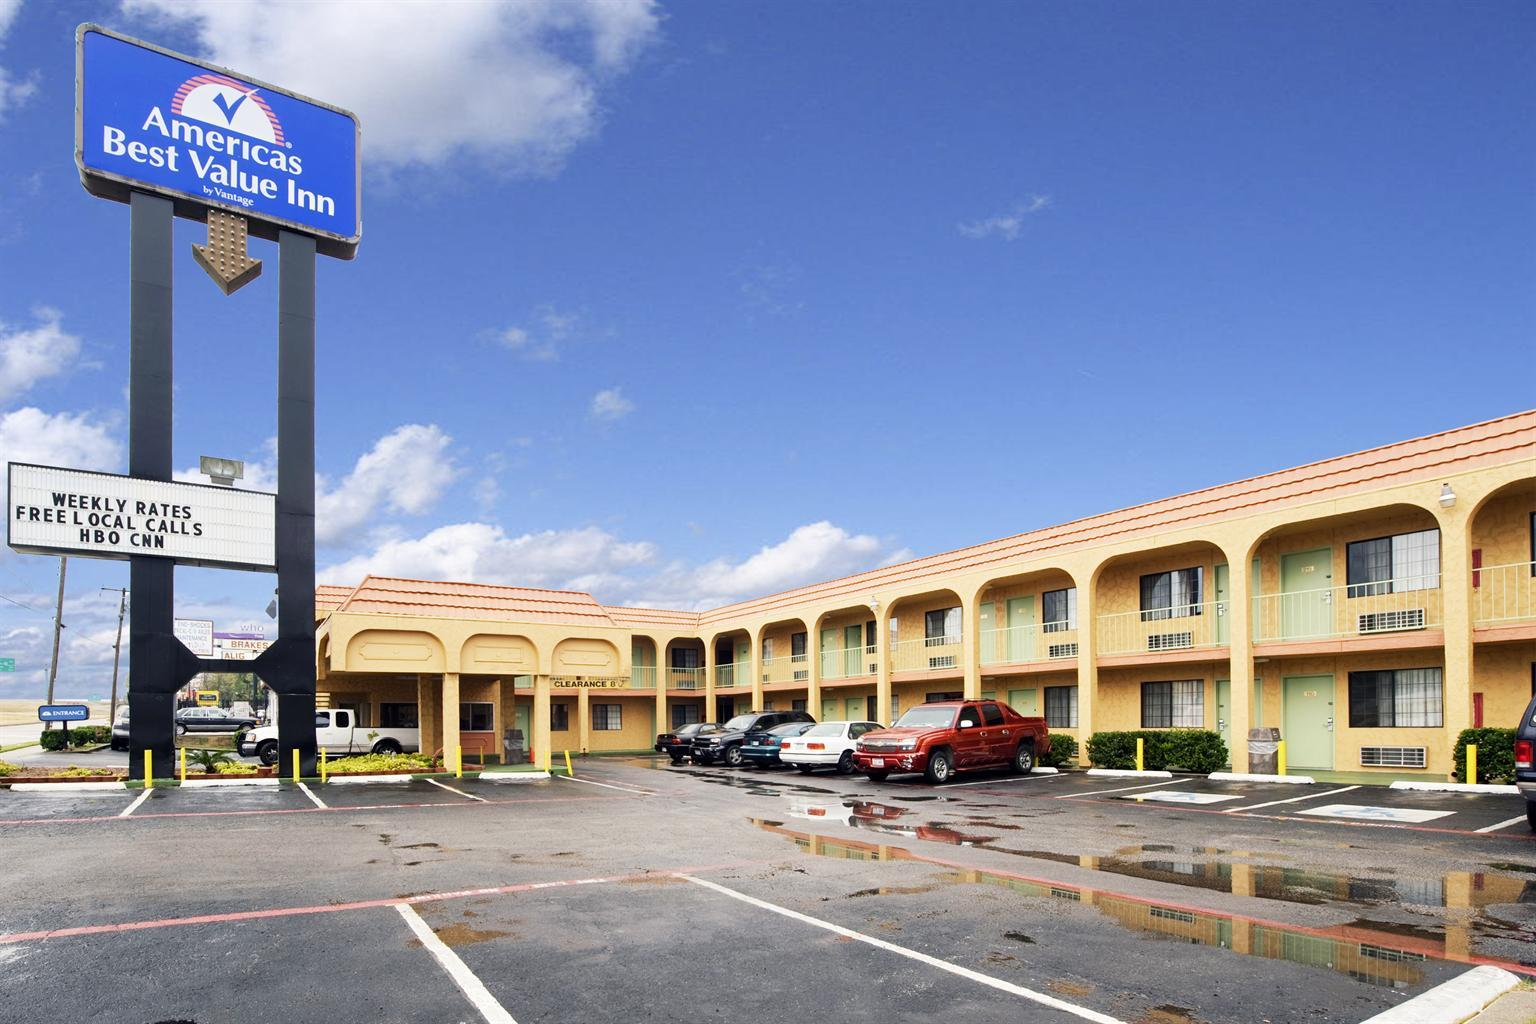 Americas Best Value Inn Dallas image 0